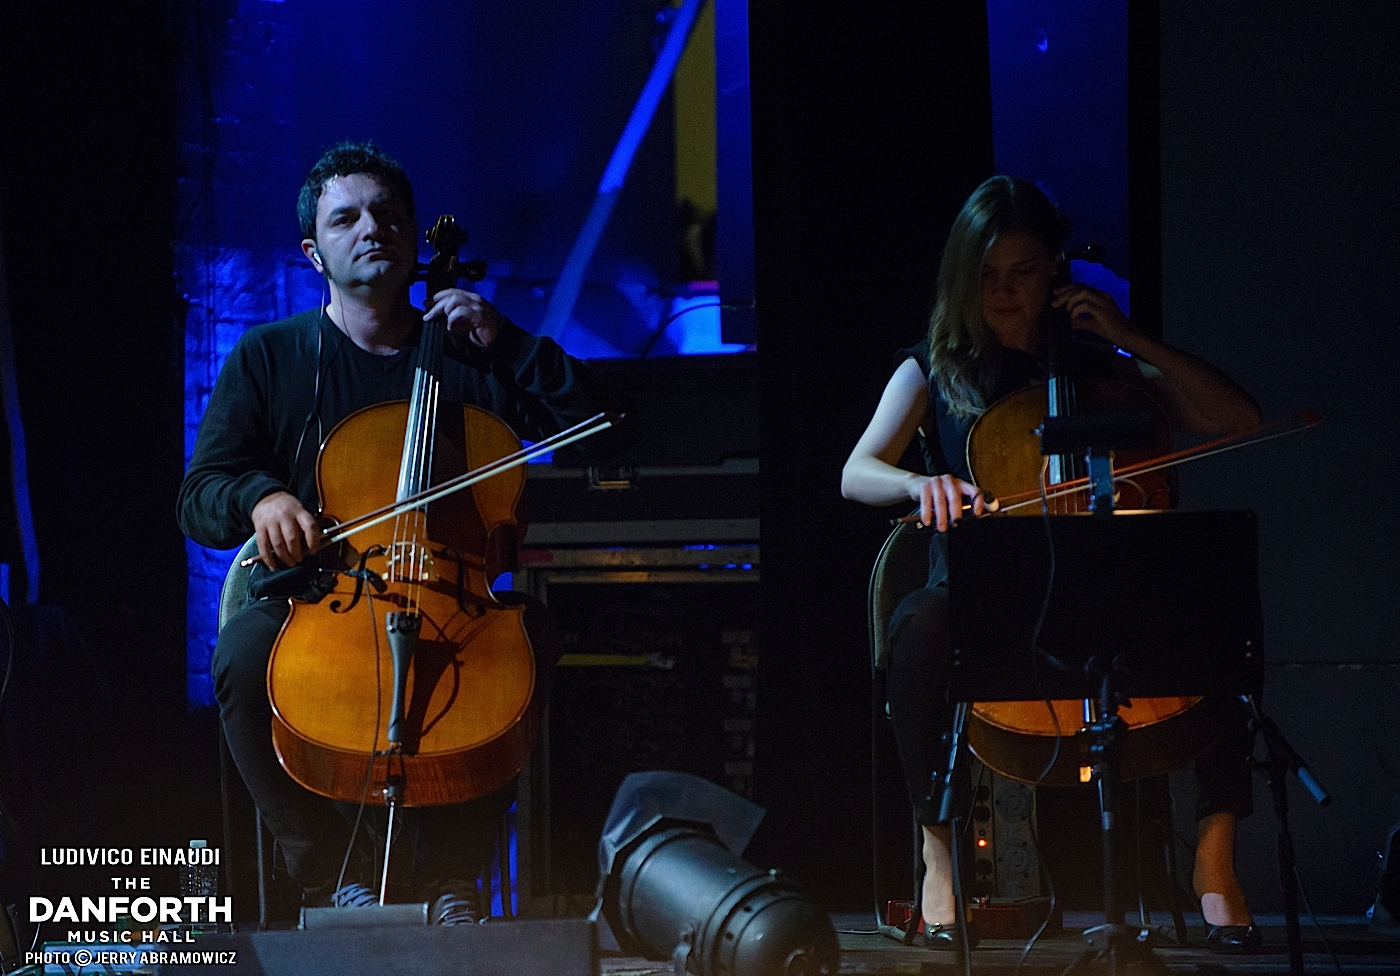 20130517 Ludivico Einaudi performs at The Danforth Music Hall Toronto 0121